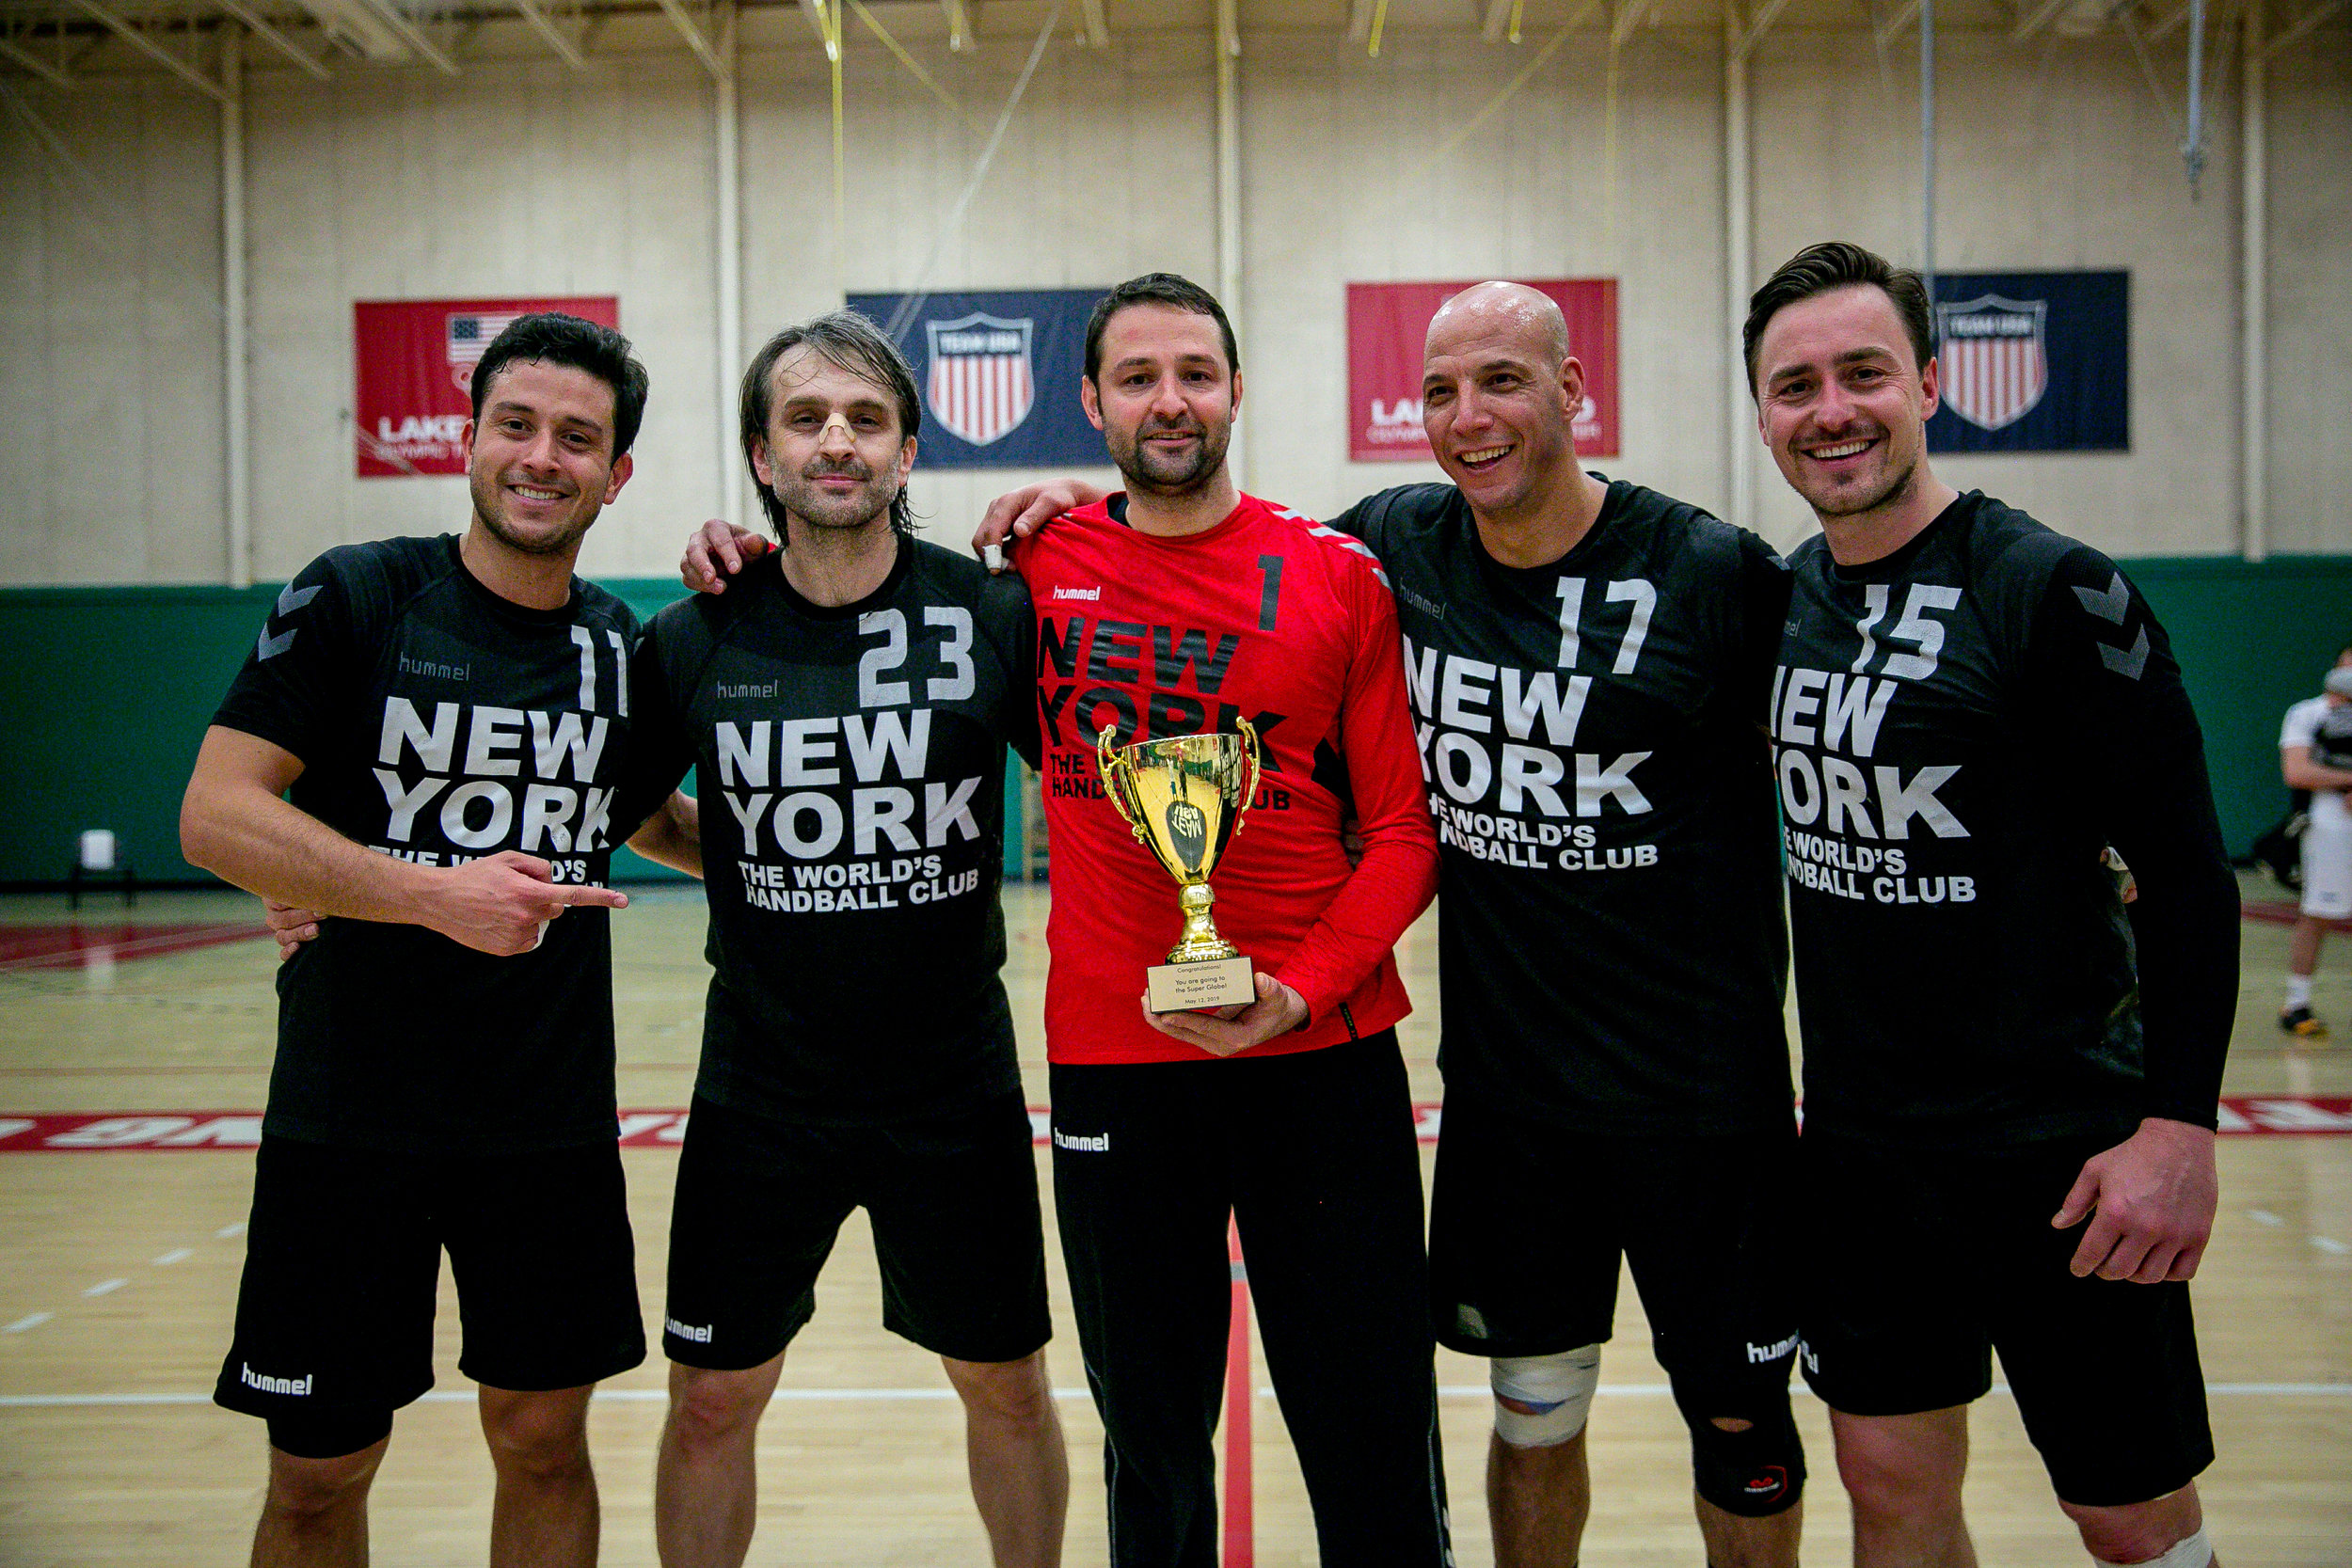 Champions of NorCa Club Championship